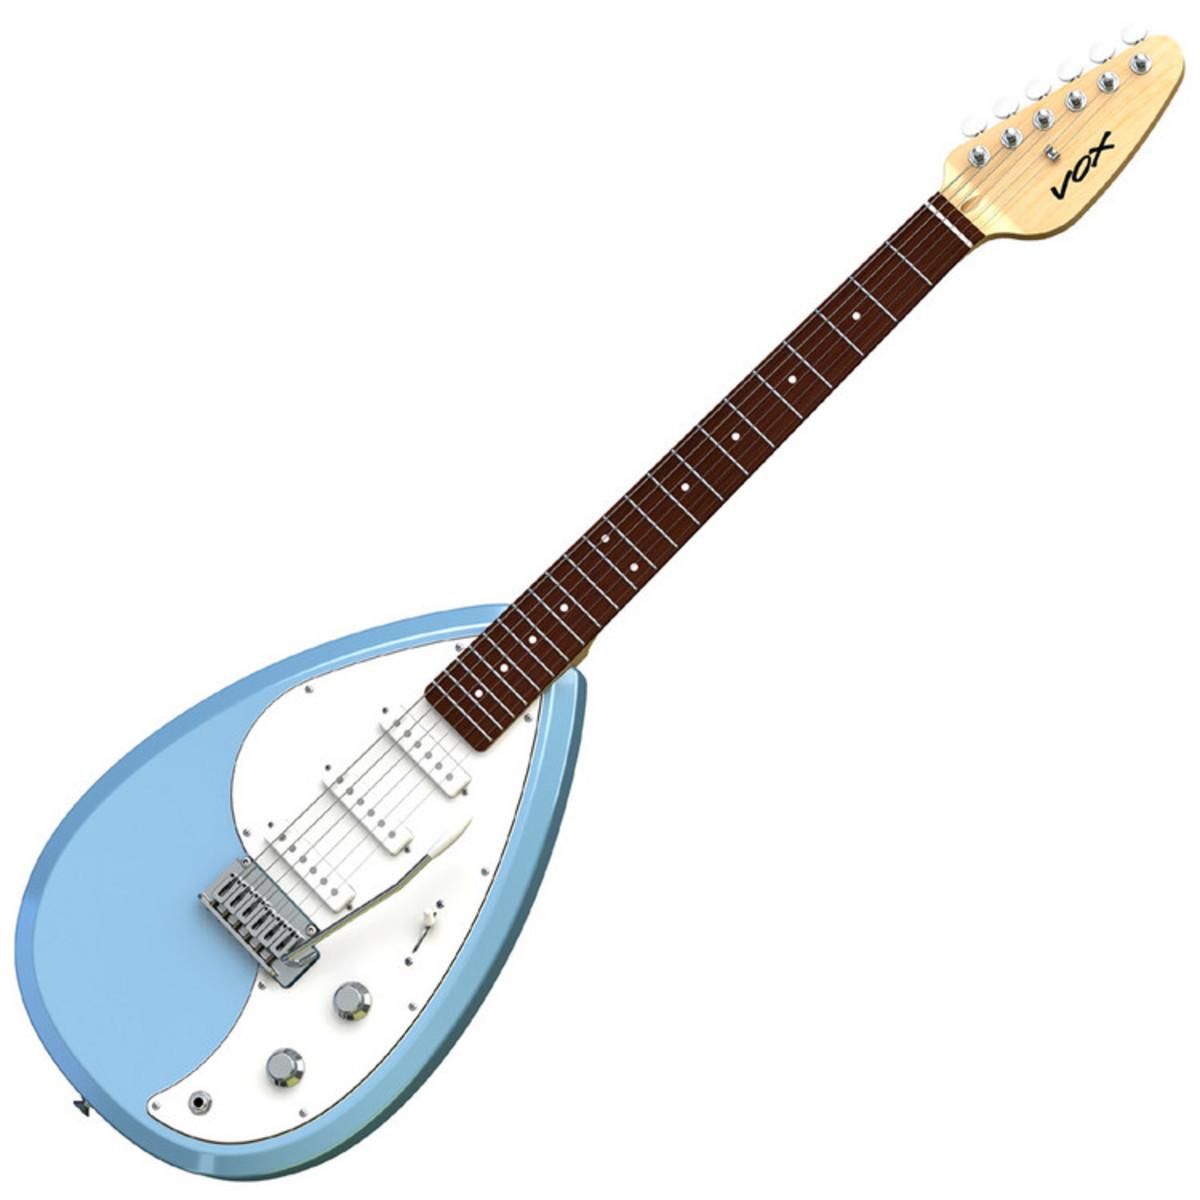 vox mkiii teardrop guitare lectrique cume. Black Bedroom Furniture Sets. Home Design Ideas